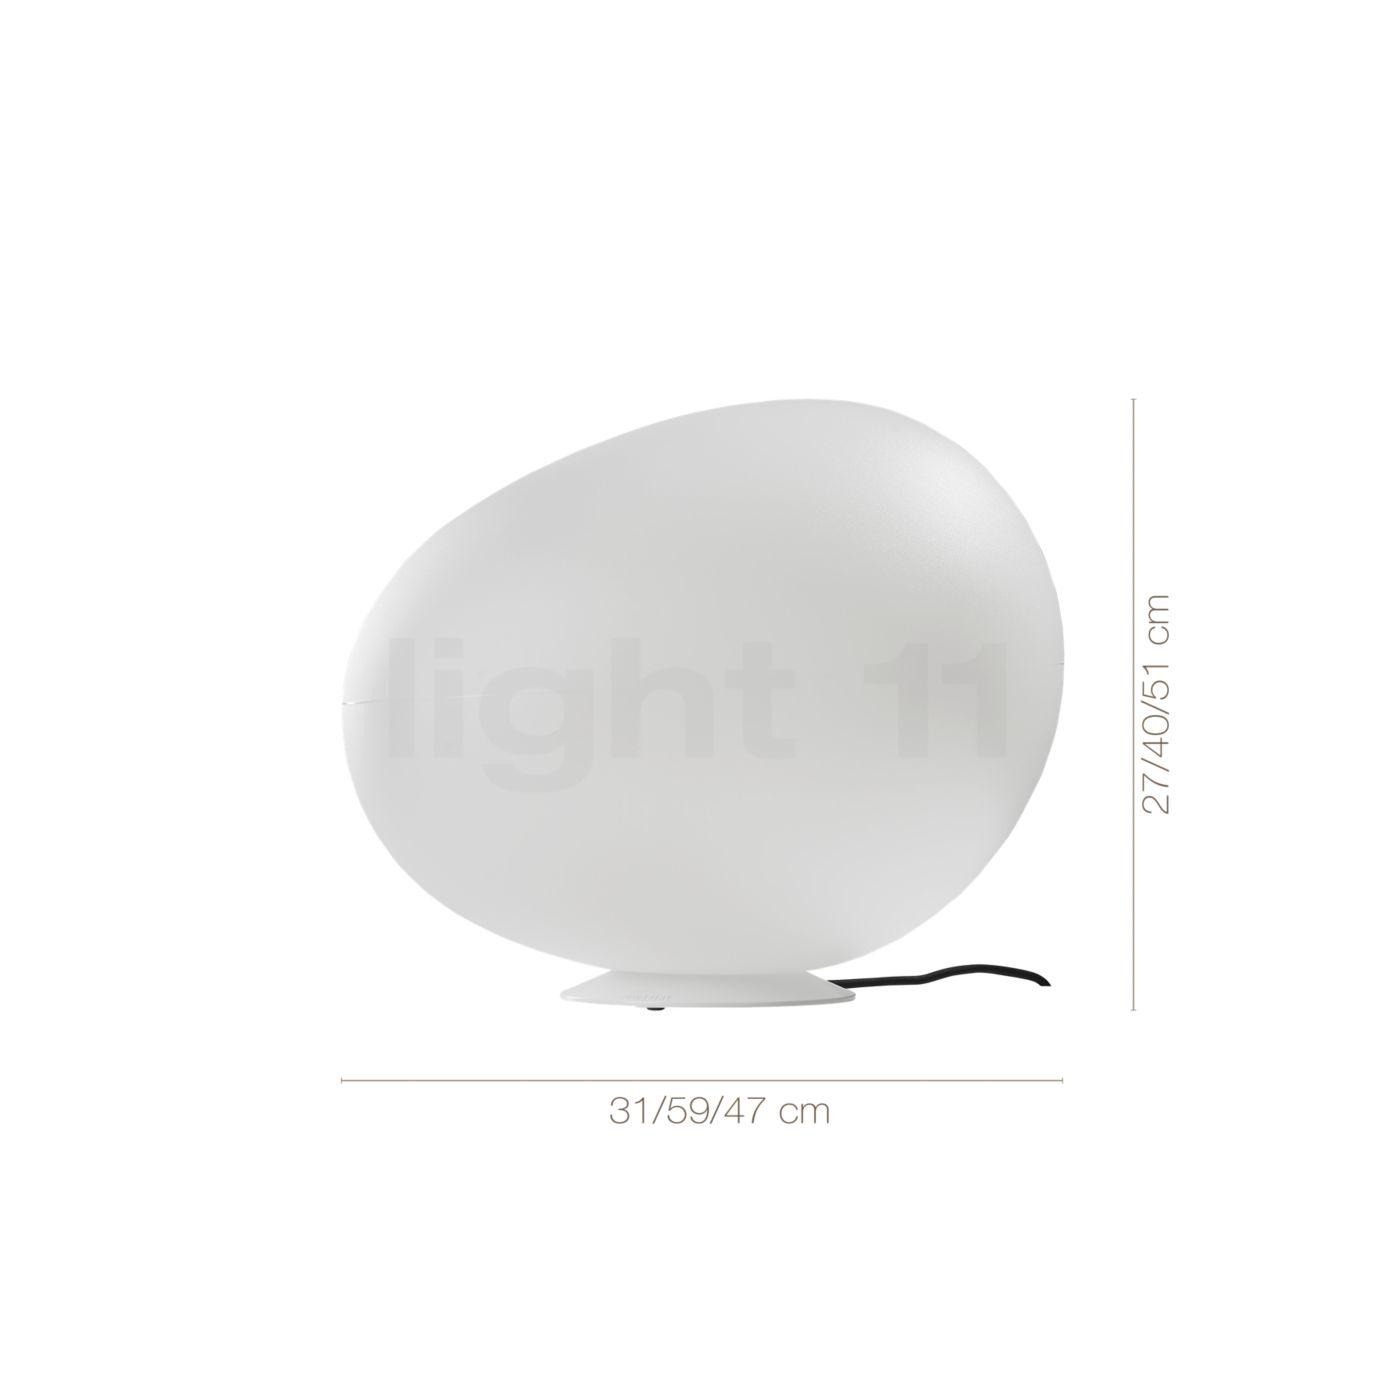 Lampe Vente Au Foscarini Gregg Outdoor En Sur Sol j35ARq4L